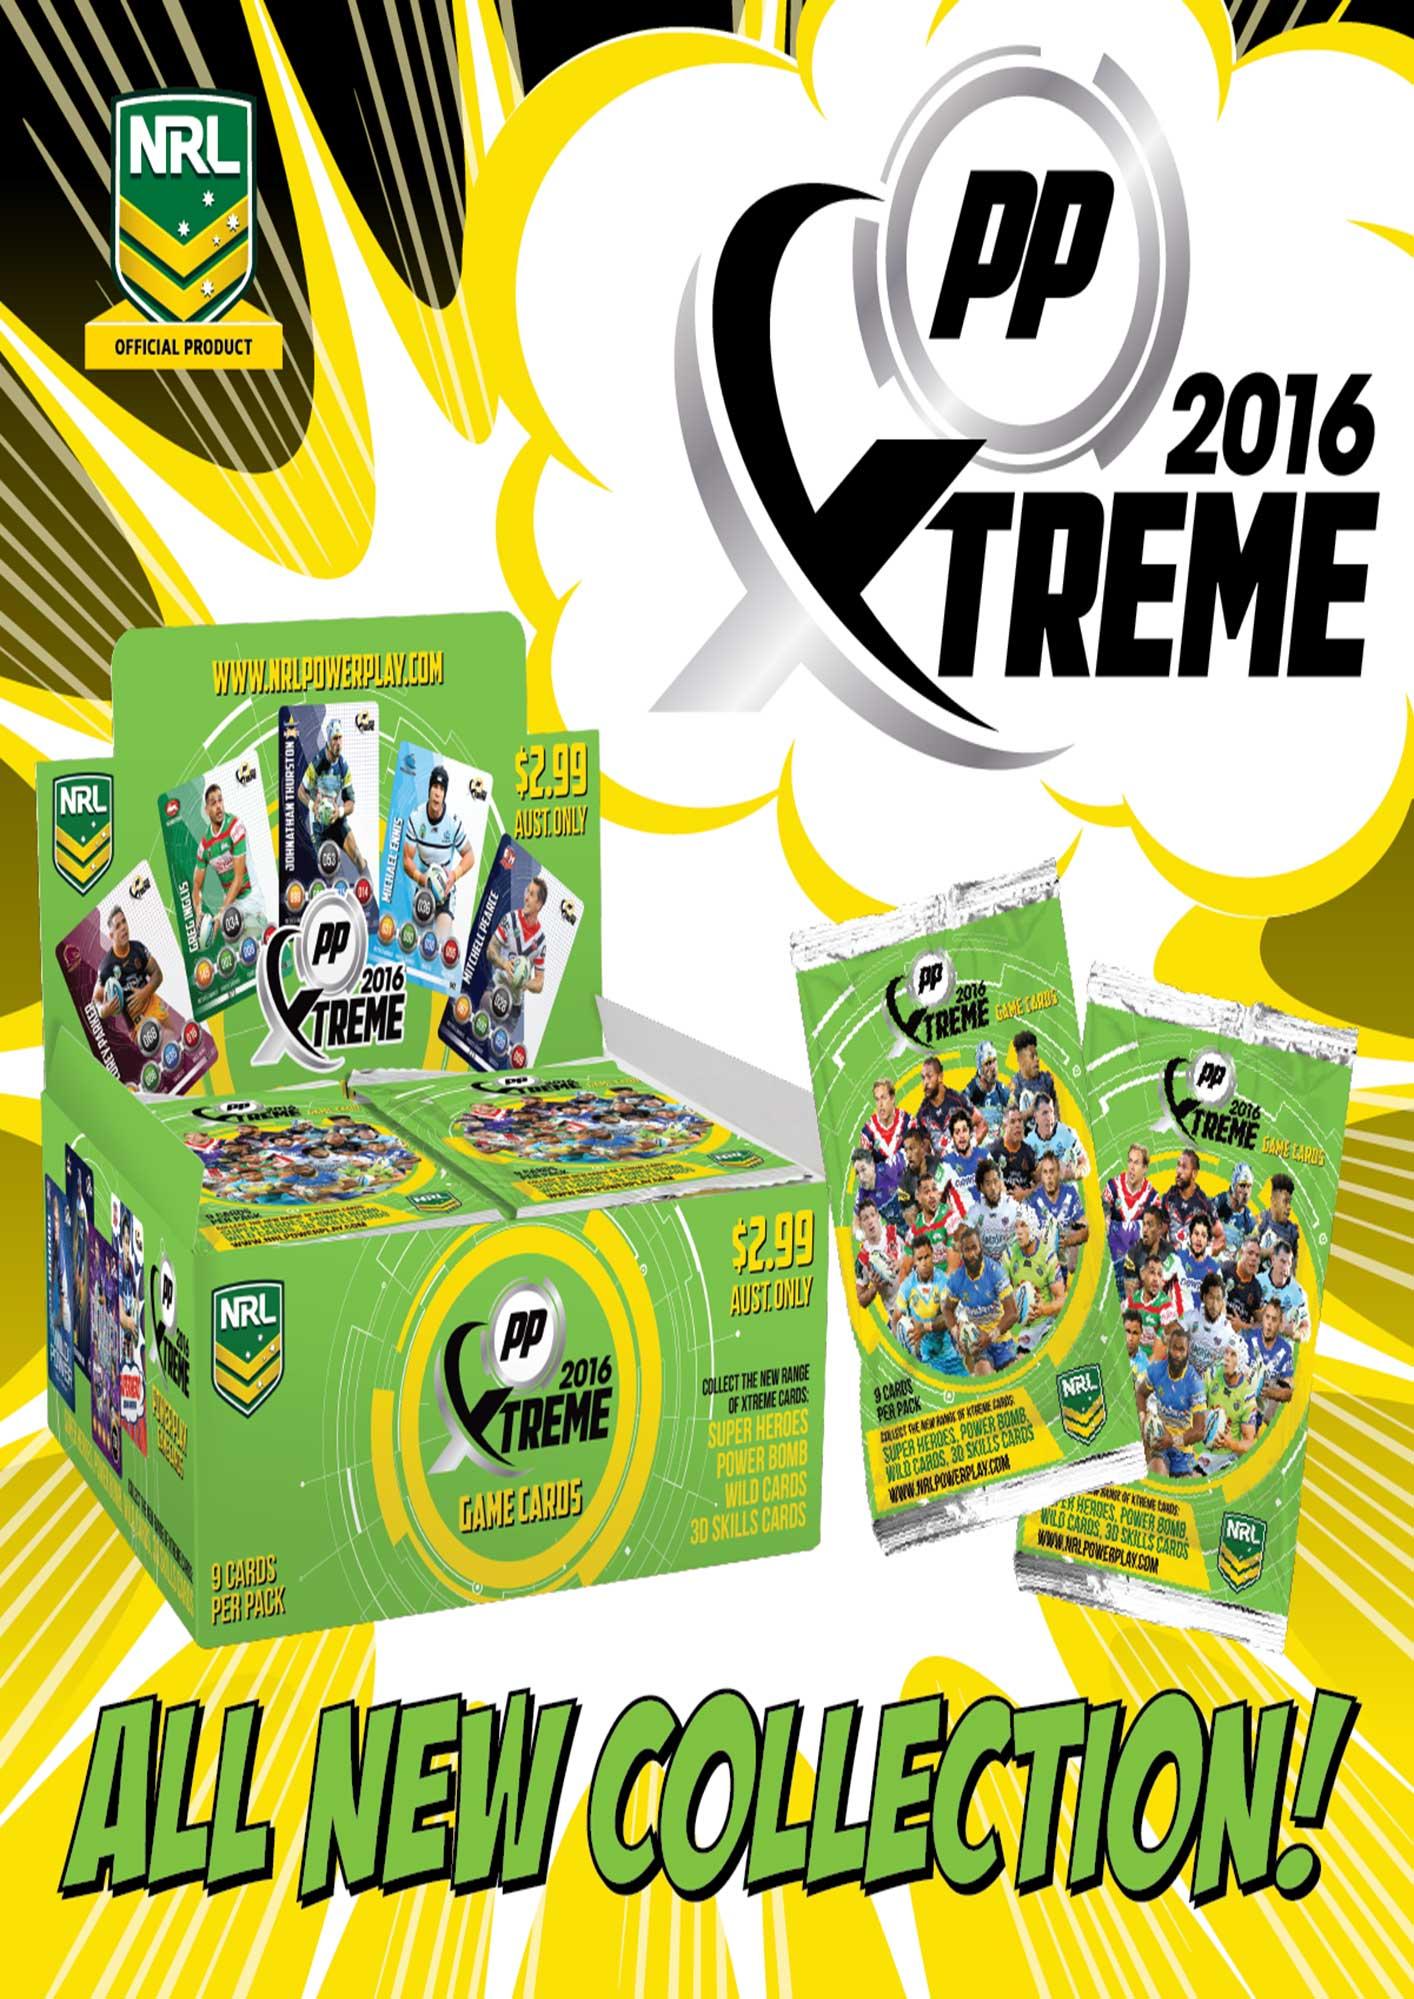 2016 NRL Xtreme Powerplay